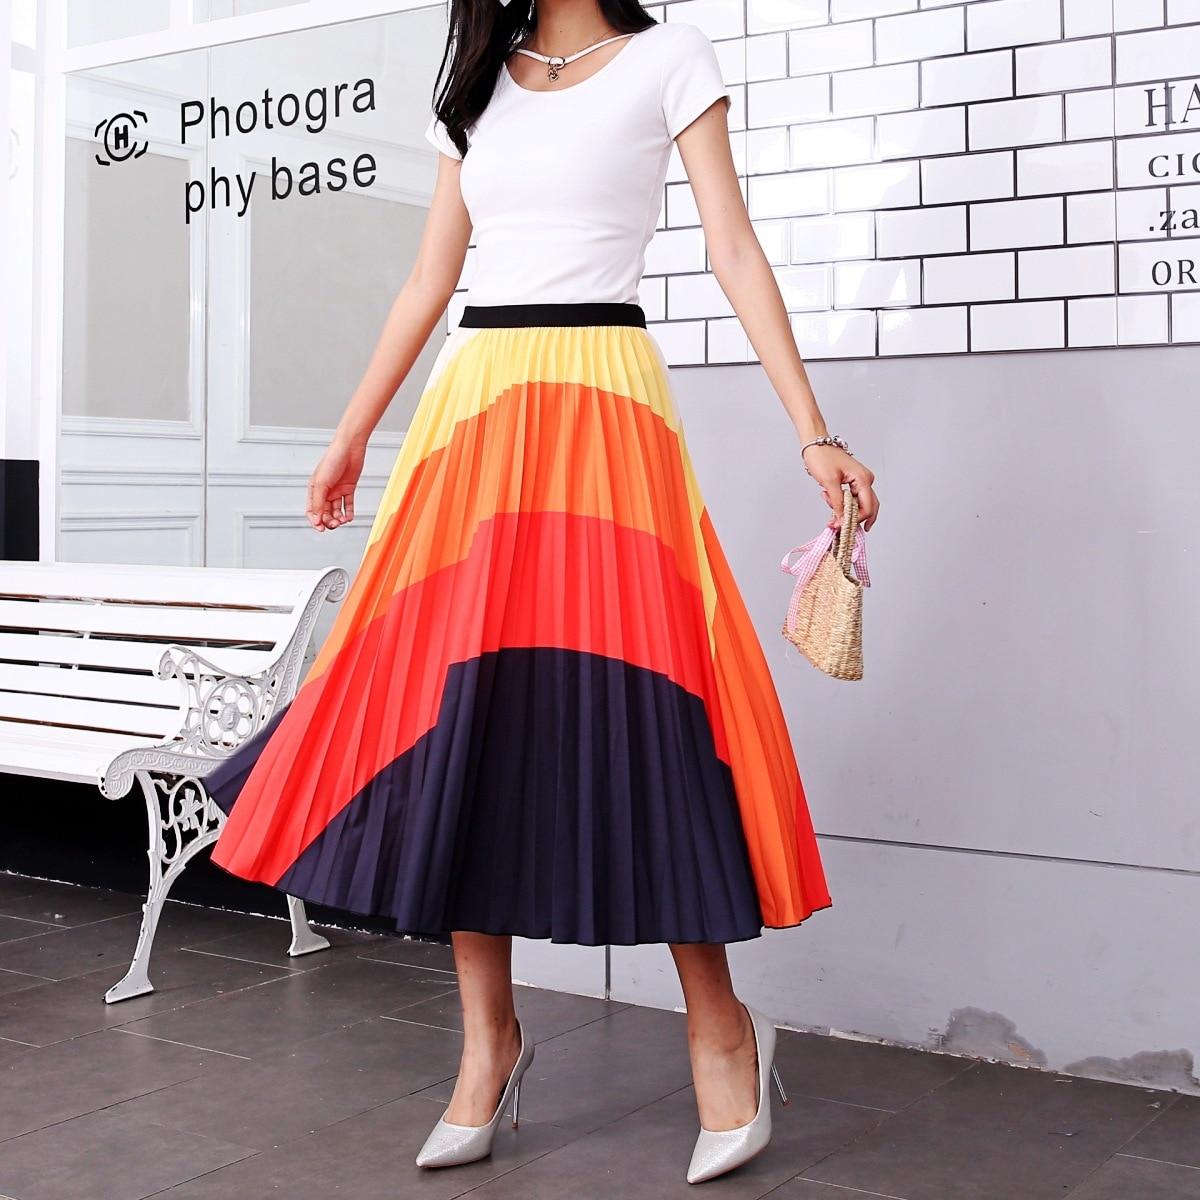 2020 New Summer Skirts Womens Butterfly Catroon Print Empire High Waist Elastci Pleated Midi Skirt European High Street Style 11